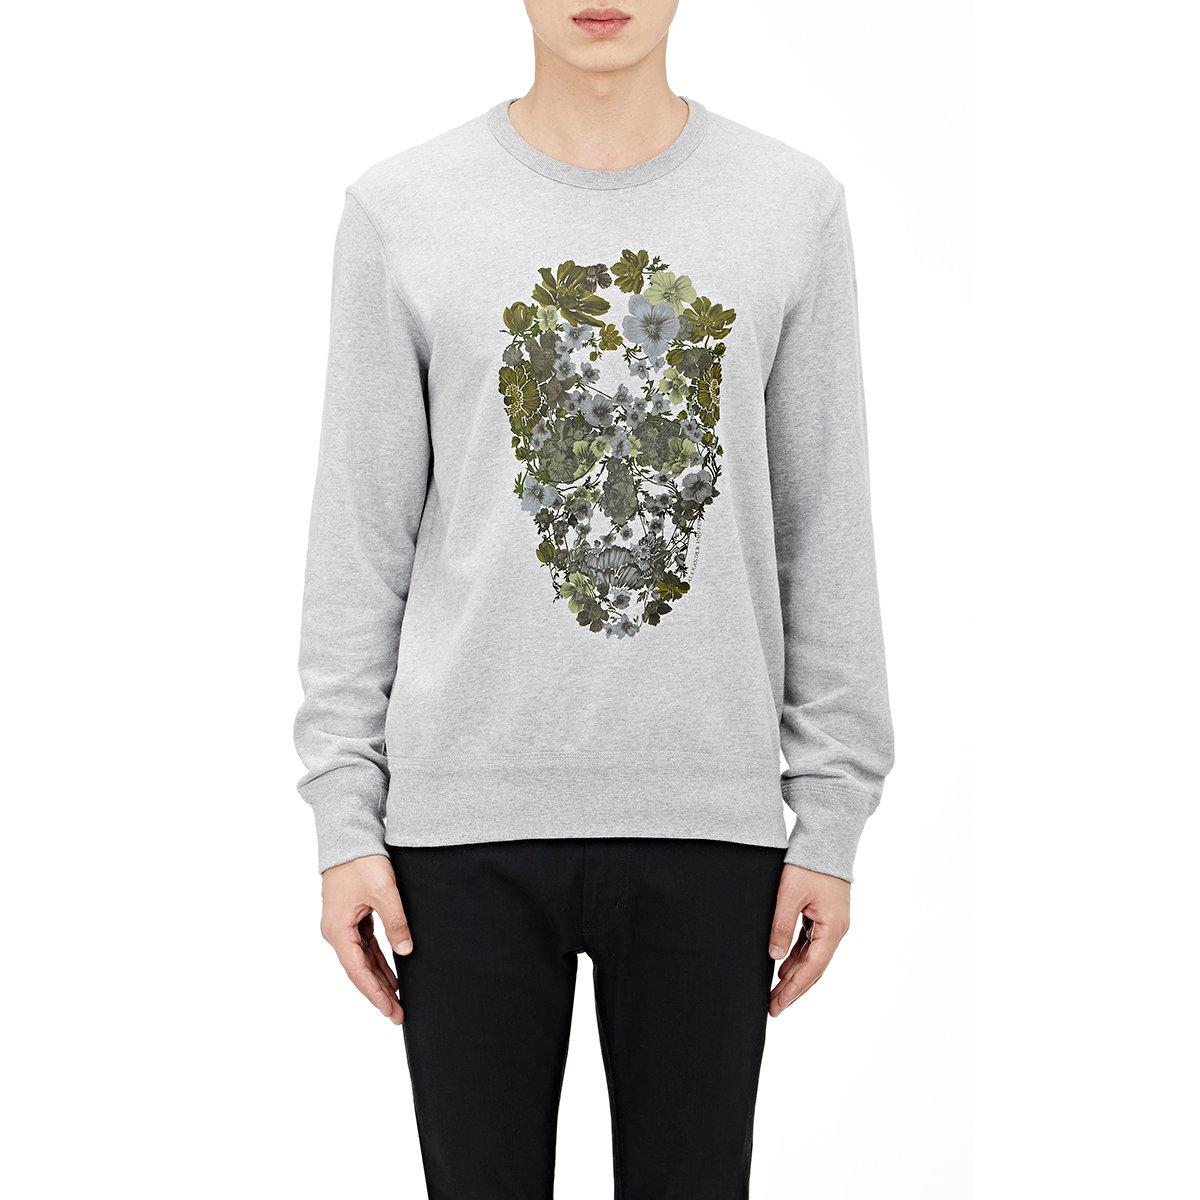 alexander mcqueen flower skull sweatshirt in gray for men lyst. Black Bedroom Furniture Sets. Home Design Ideas